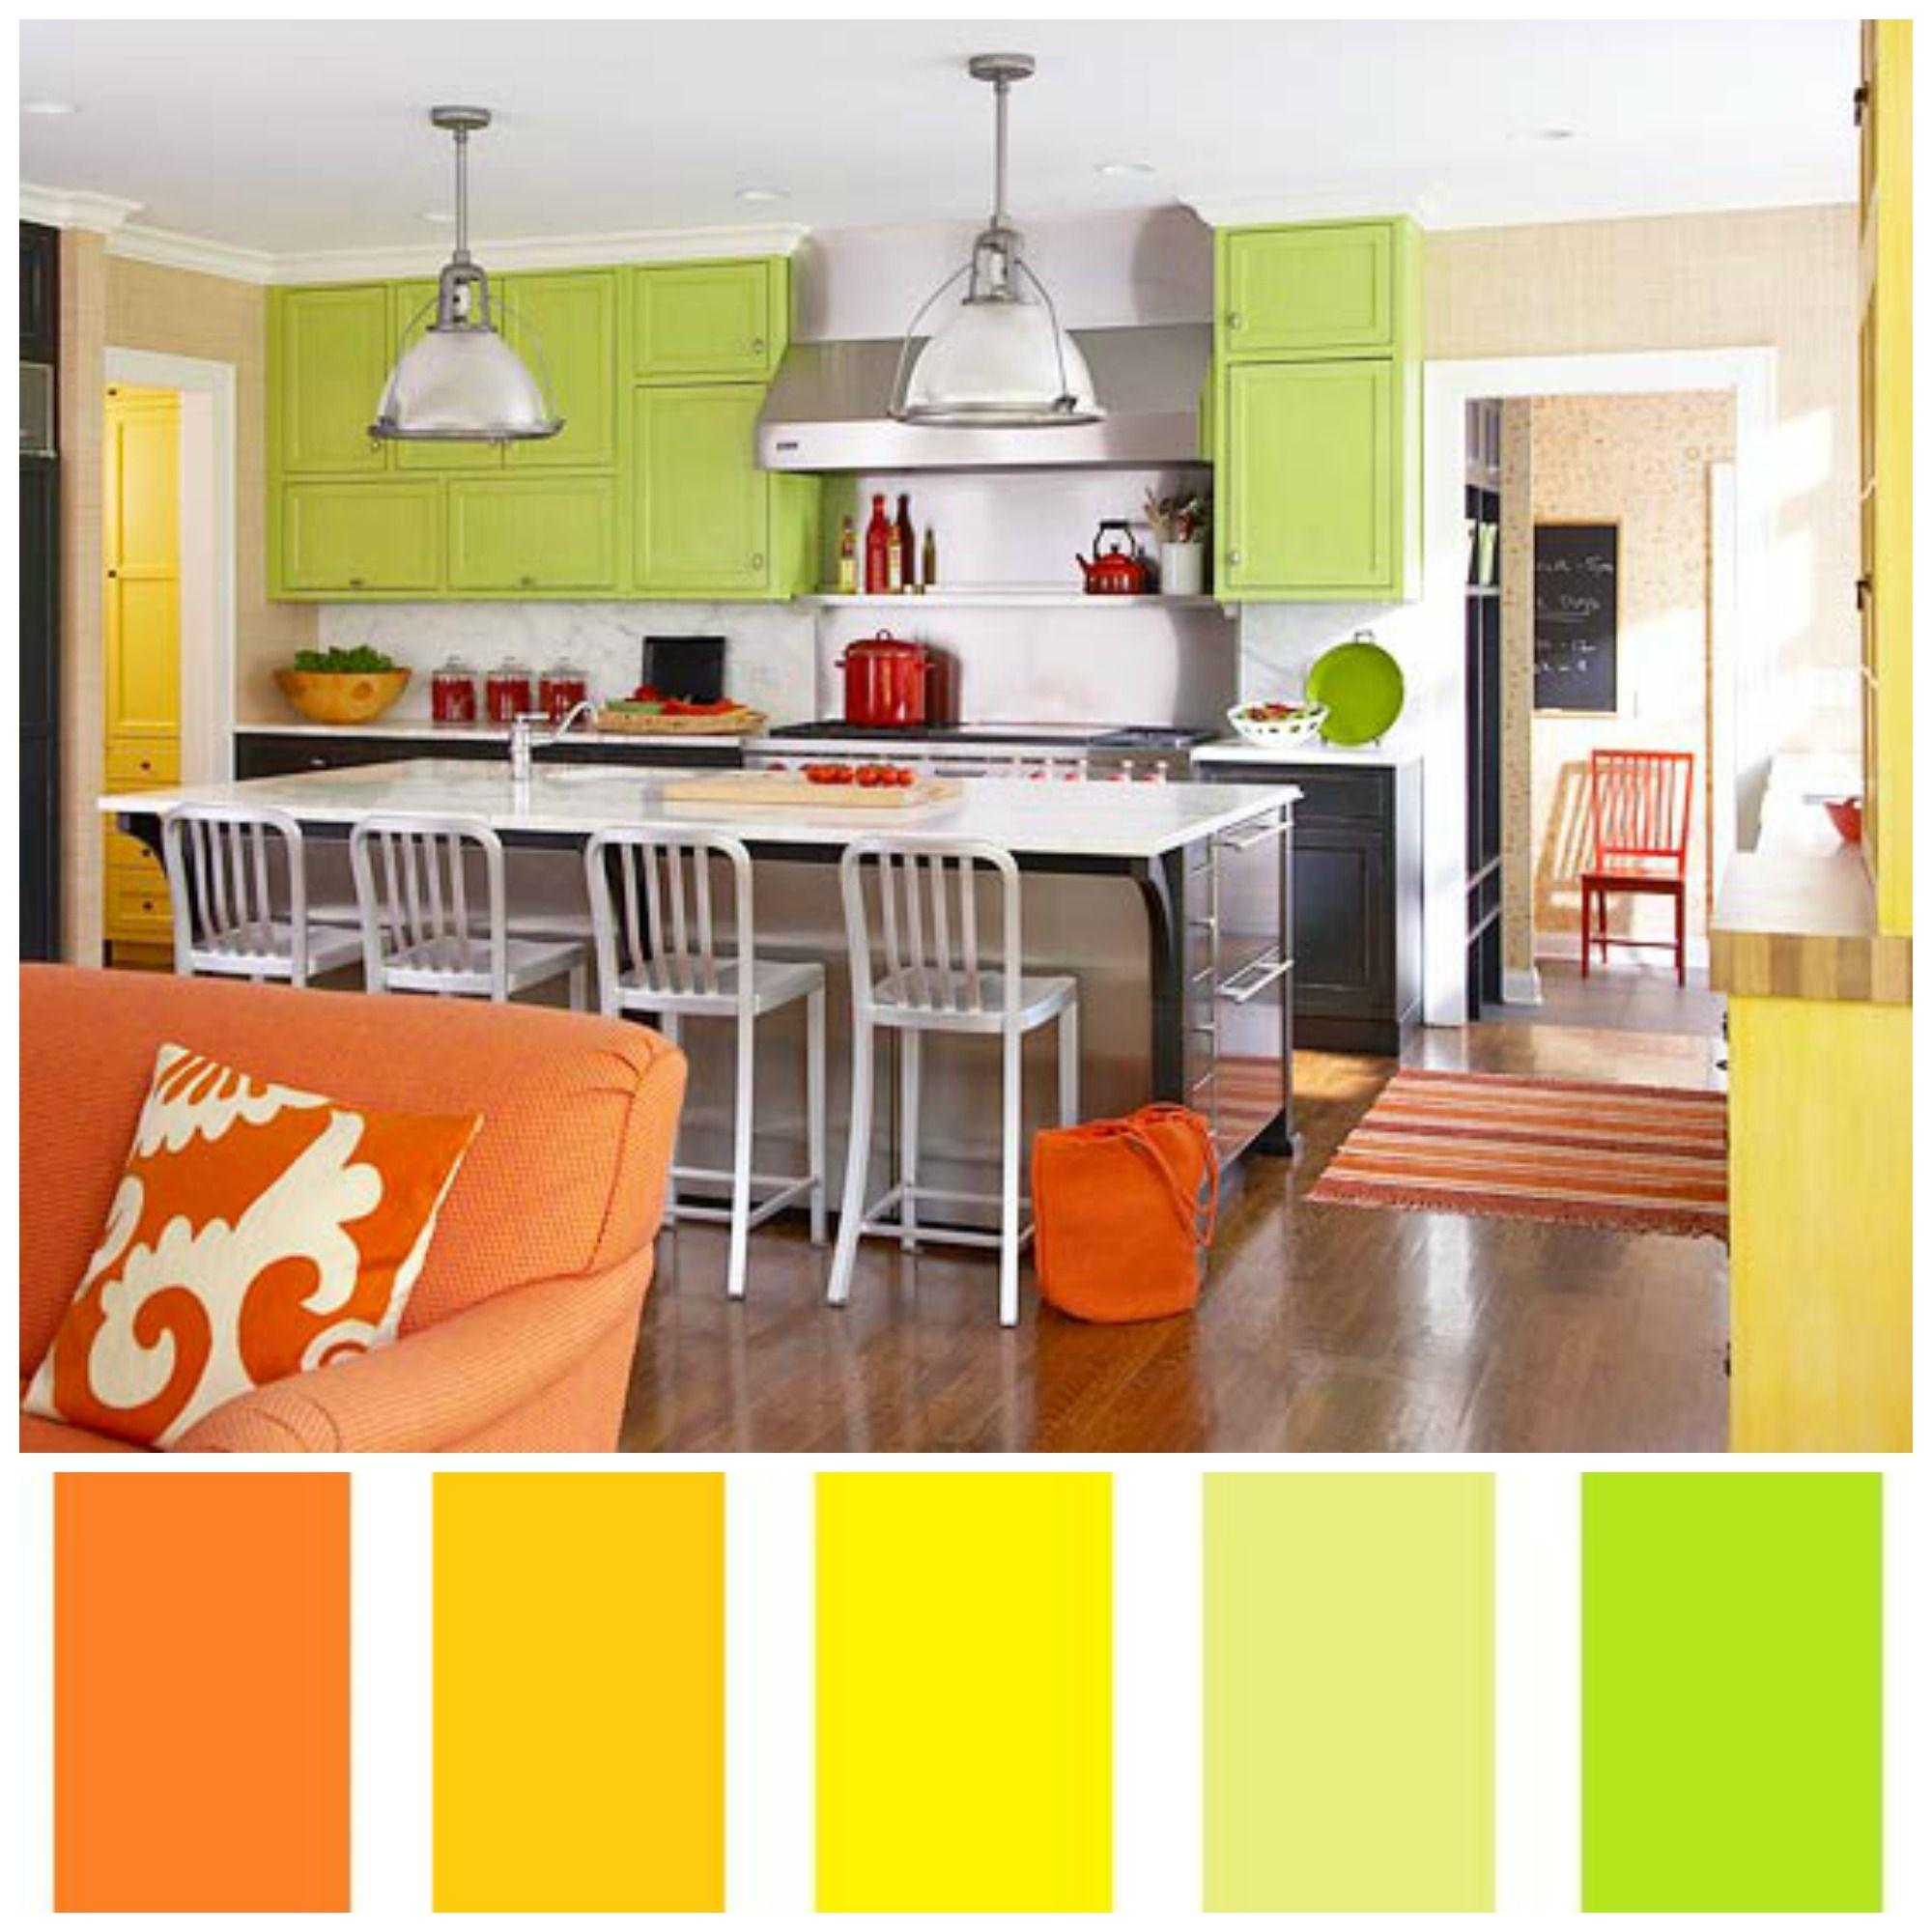 Modern Kitchen Analogous Kitchen Inspirational Orange Coloured